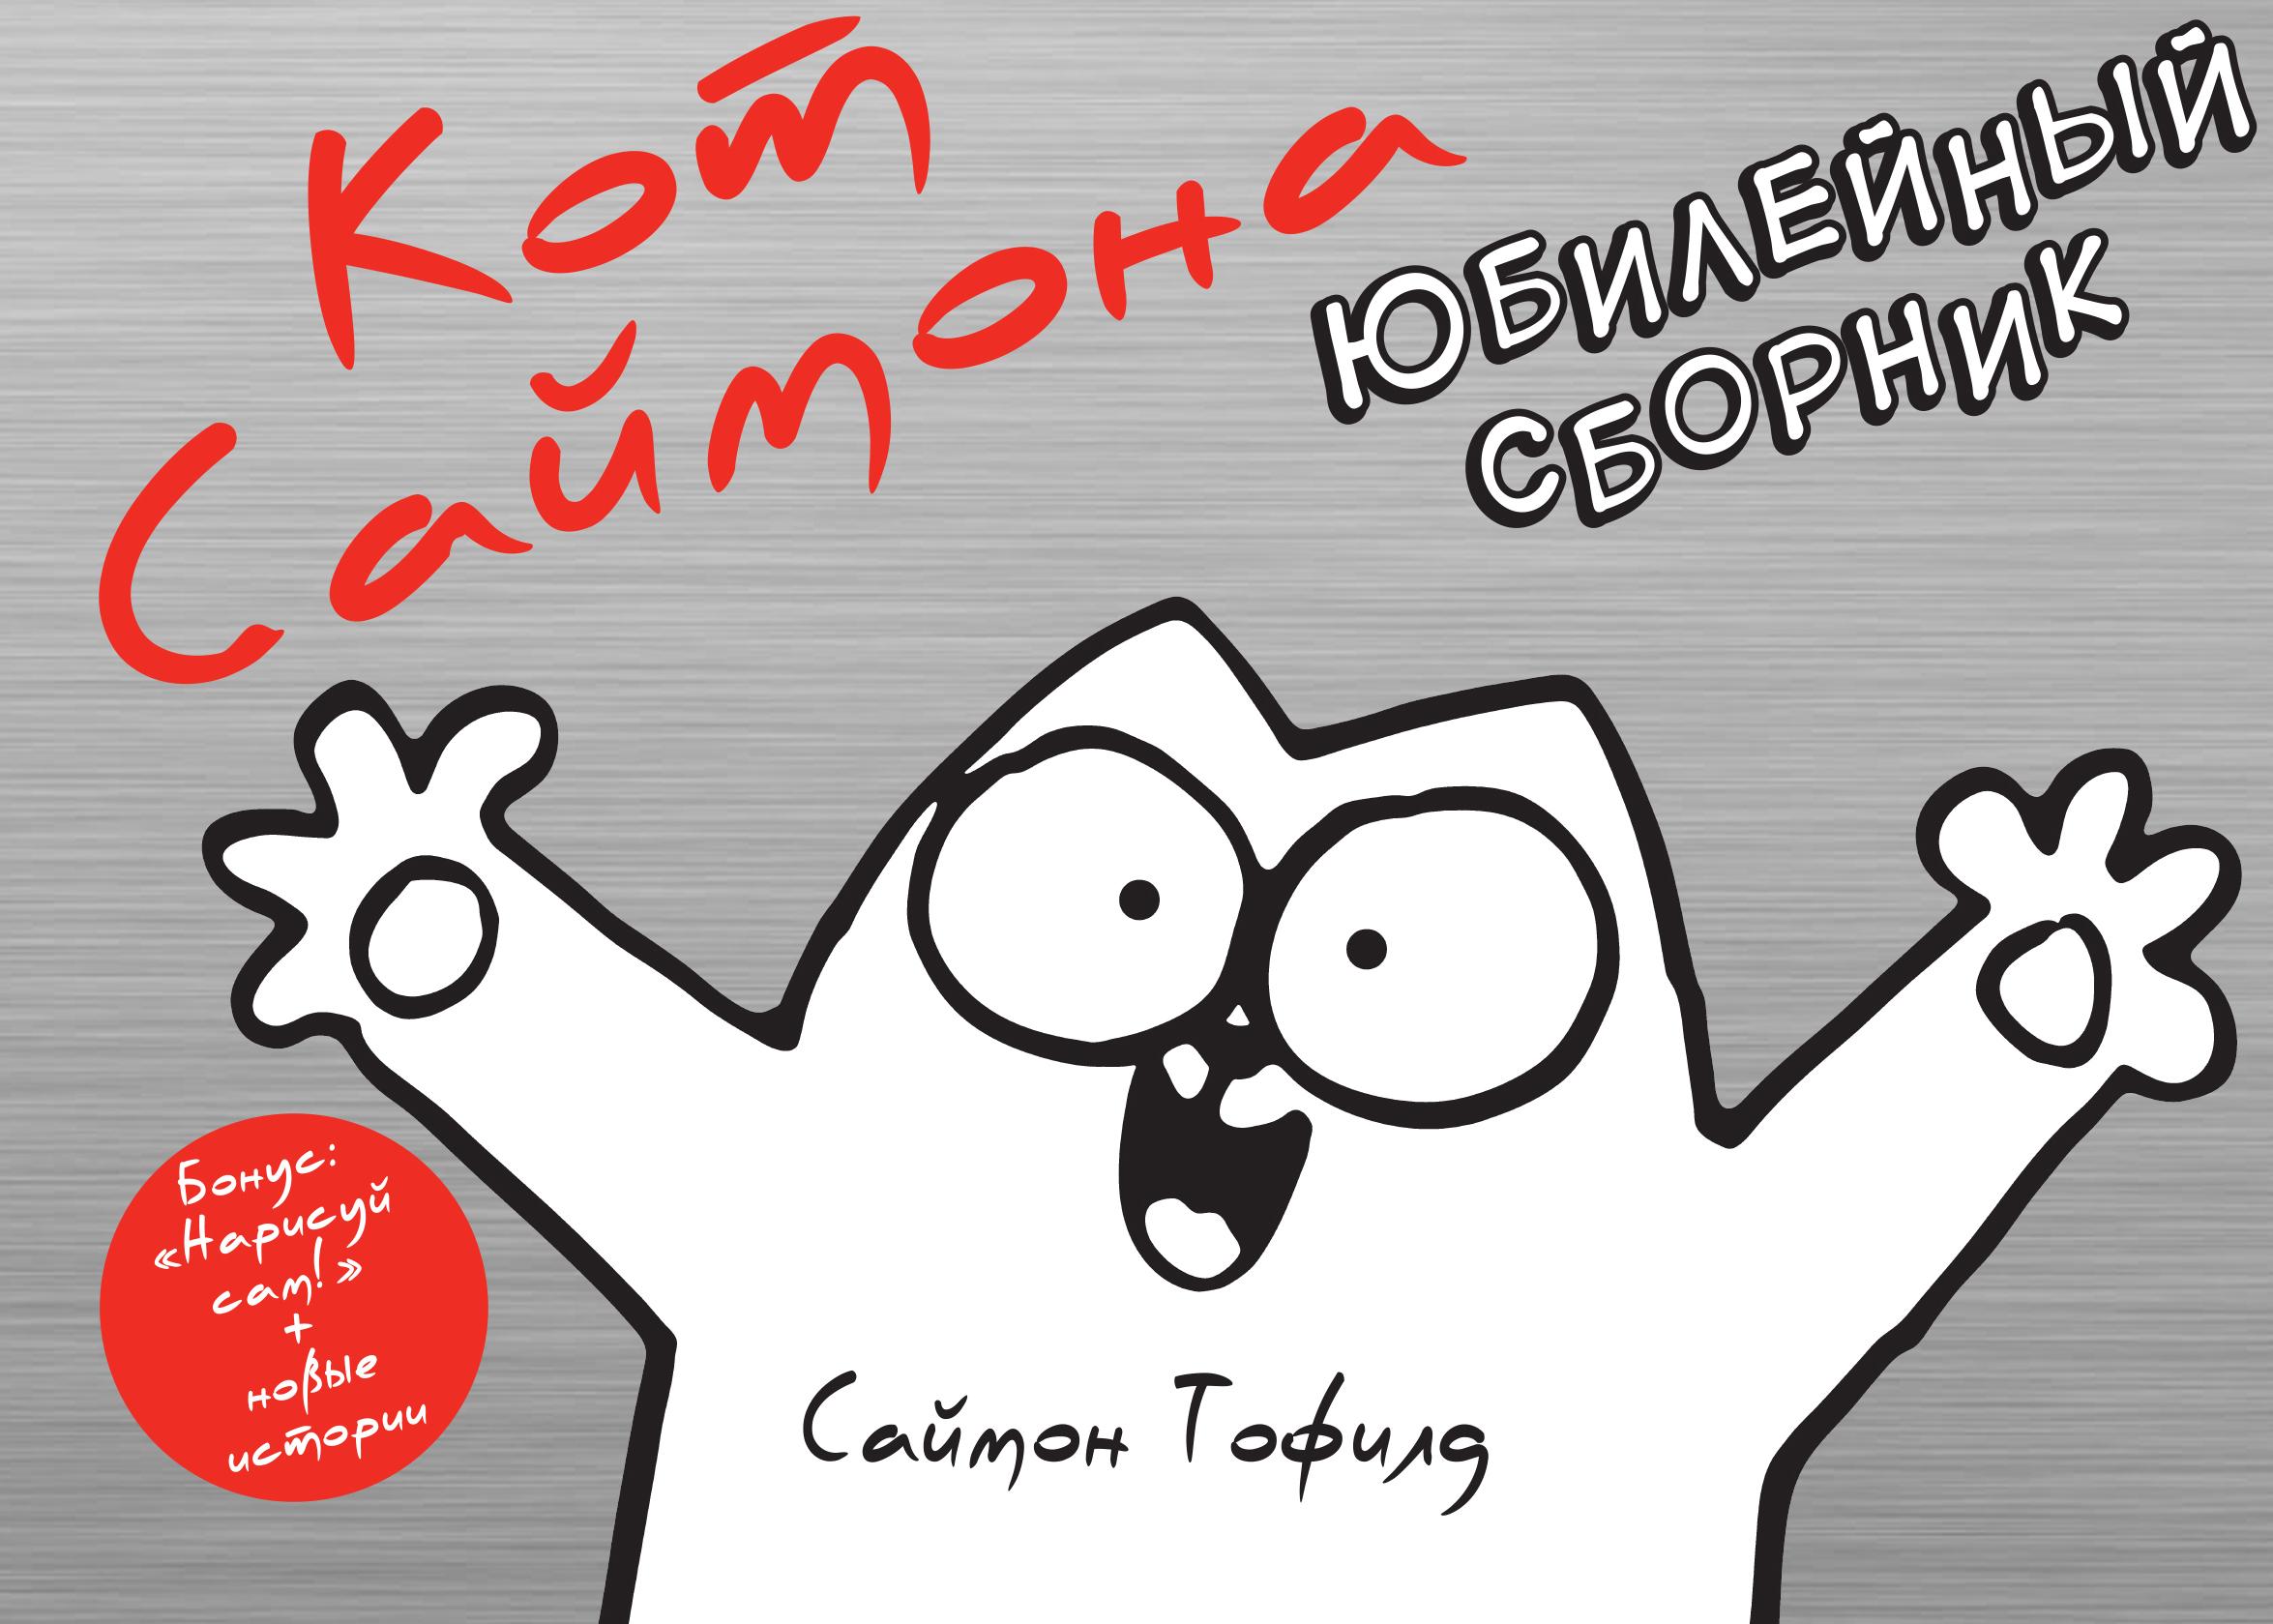 Саймон Тофилд Кот Саймона. Юбилейный сборник тофилд саймон кот саймона 6 у ветеринара или 33 прививки от скуки 6